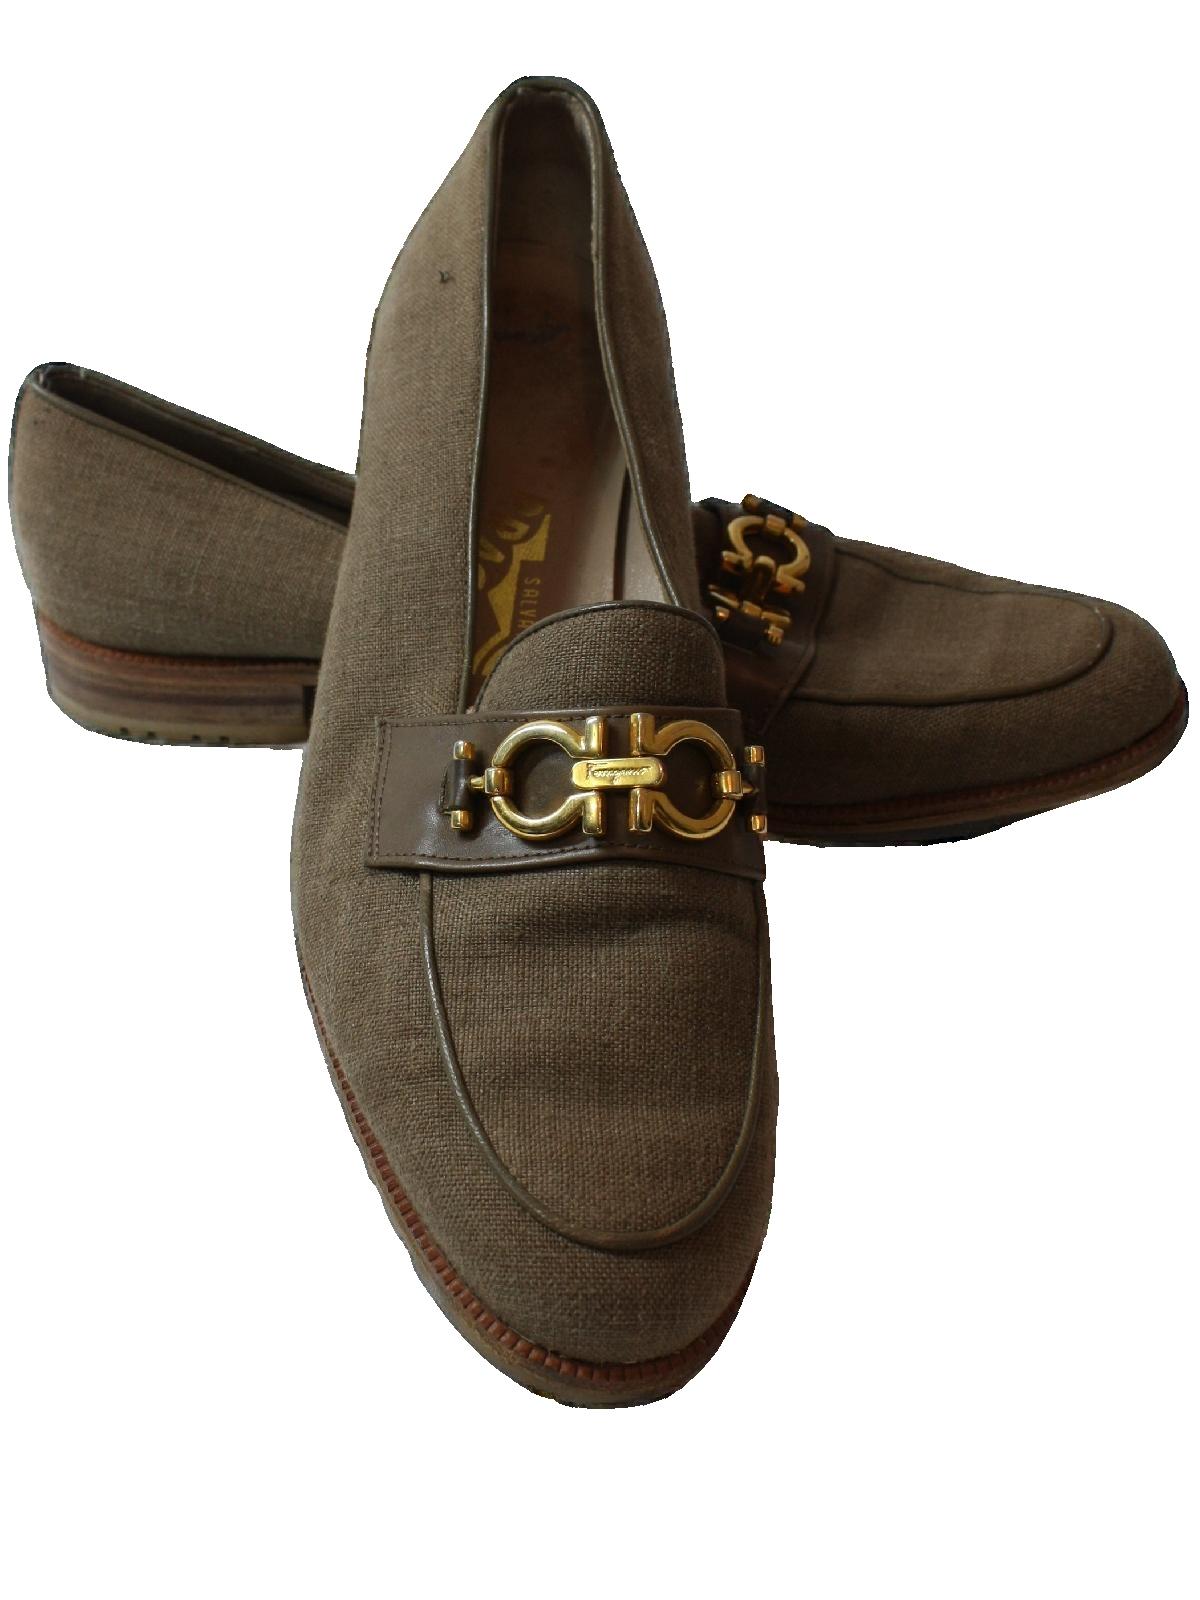 9840d7b8b95 Vintage Salvatore Ferragamo 1980s Shoes  80s -Salvatore Ferragamo ...